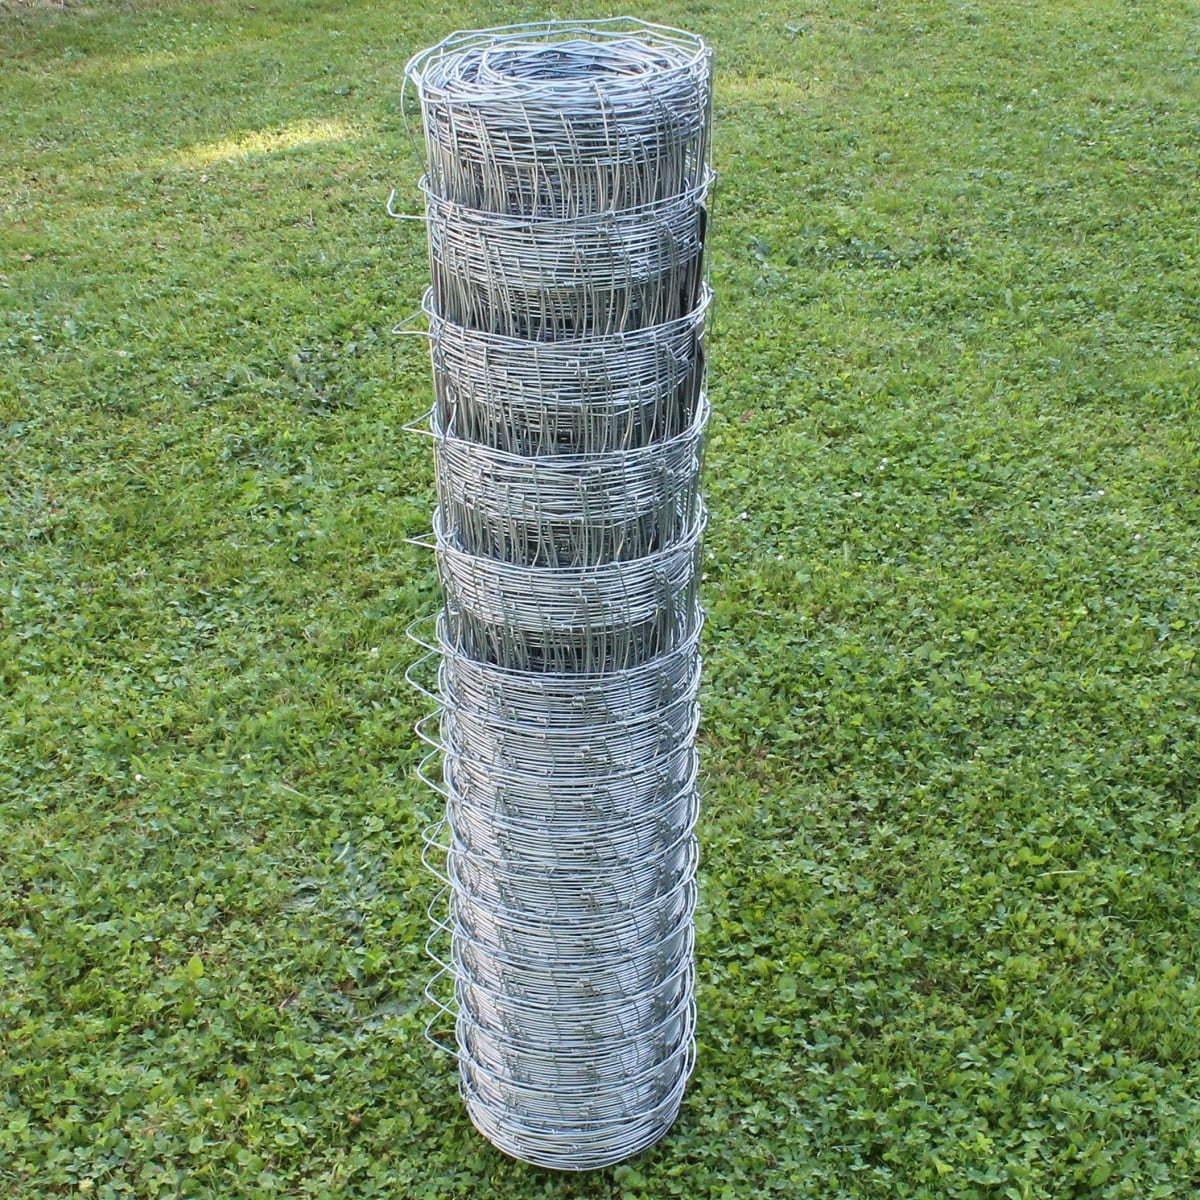 Knotengeflecht - L 130/18/15 - 2,4/1,9 mm starkverzinkt ...